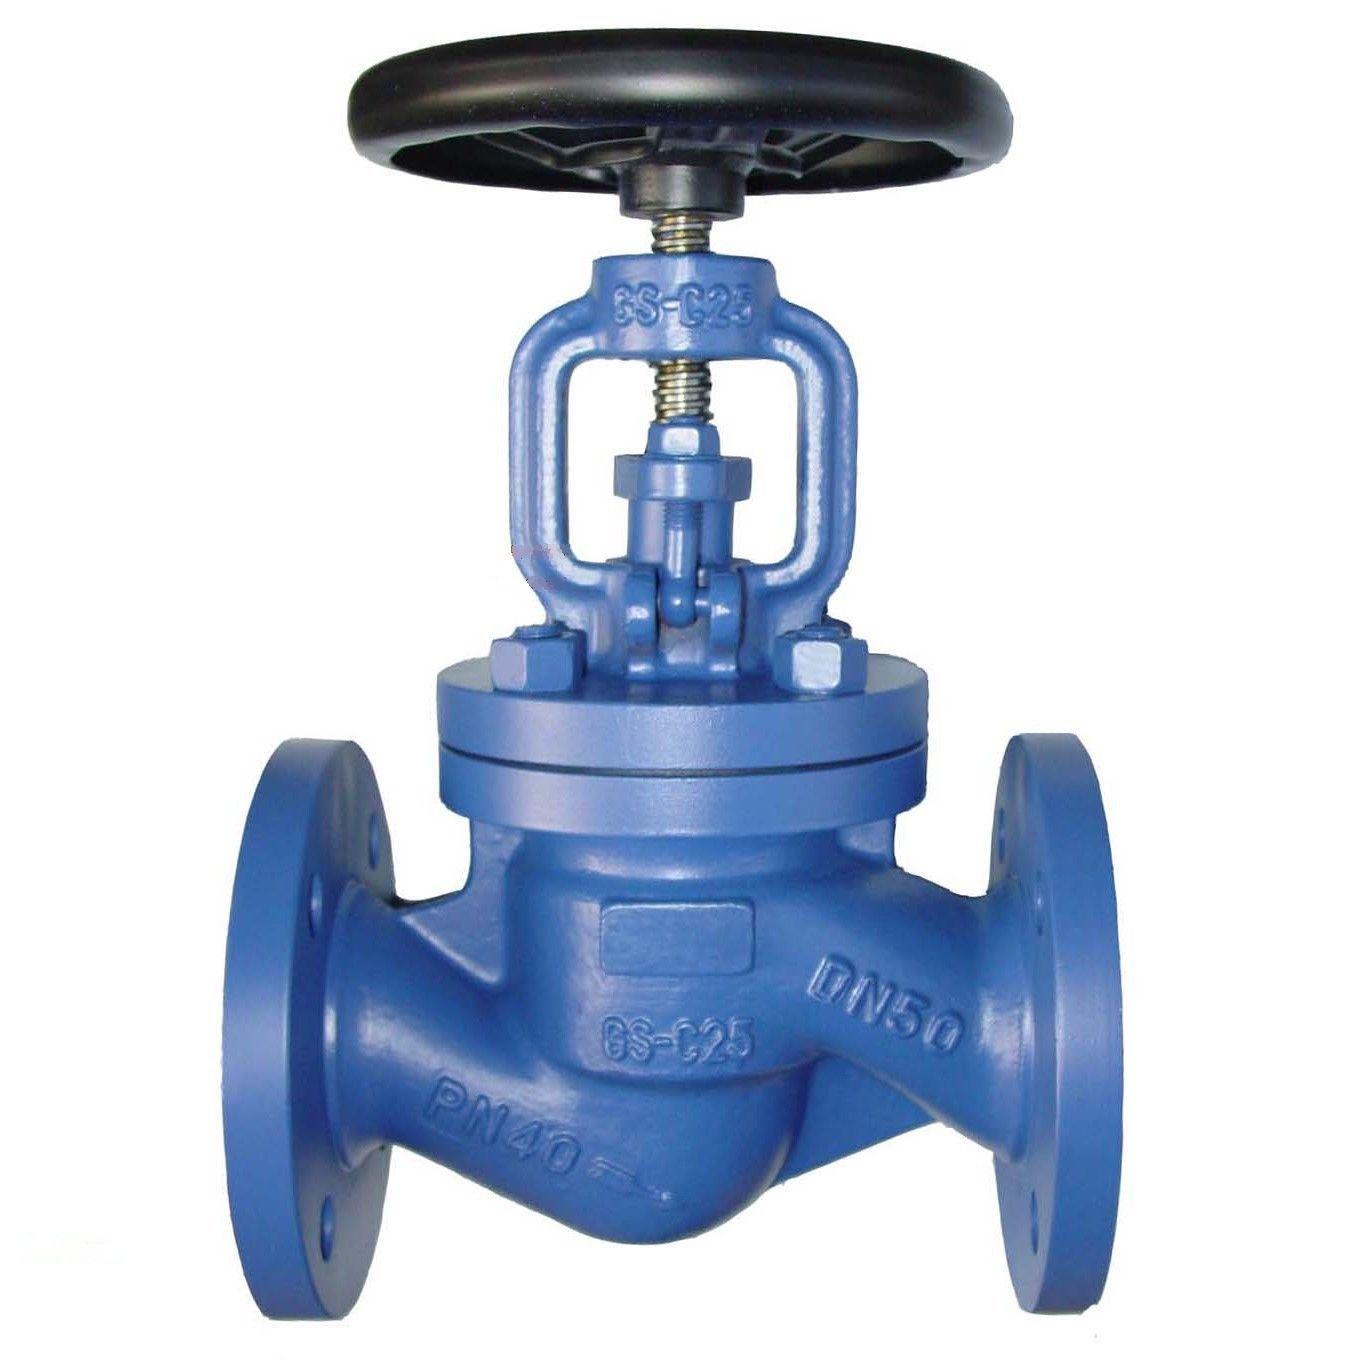 High Quality Dn400 Butterfly Valve - Cast iron flange globe valve – Jinbin Valve